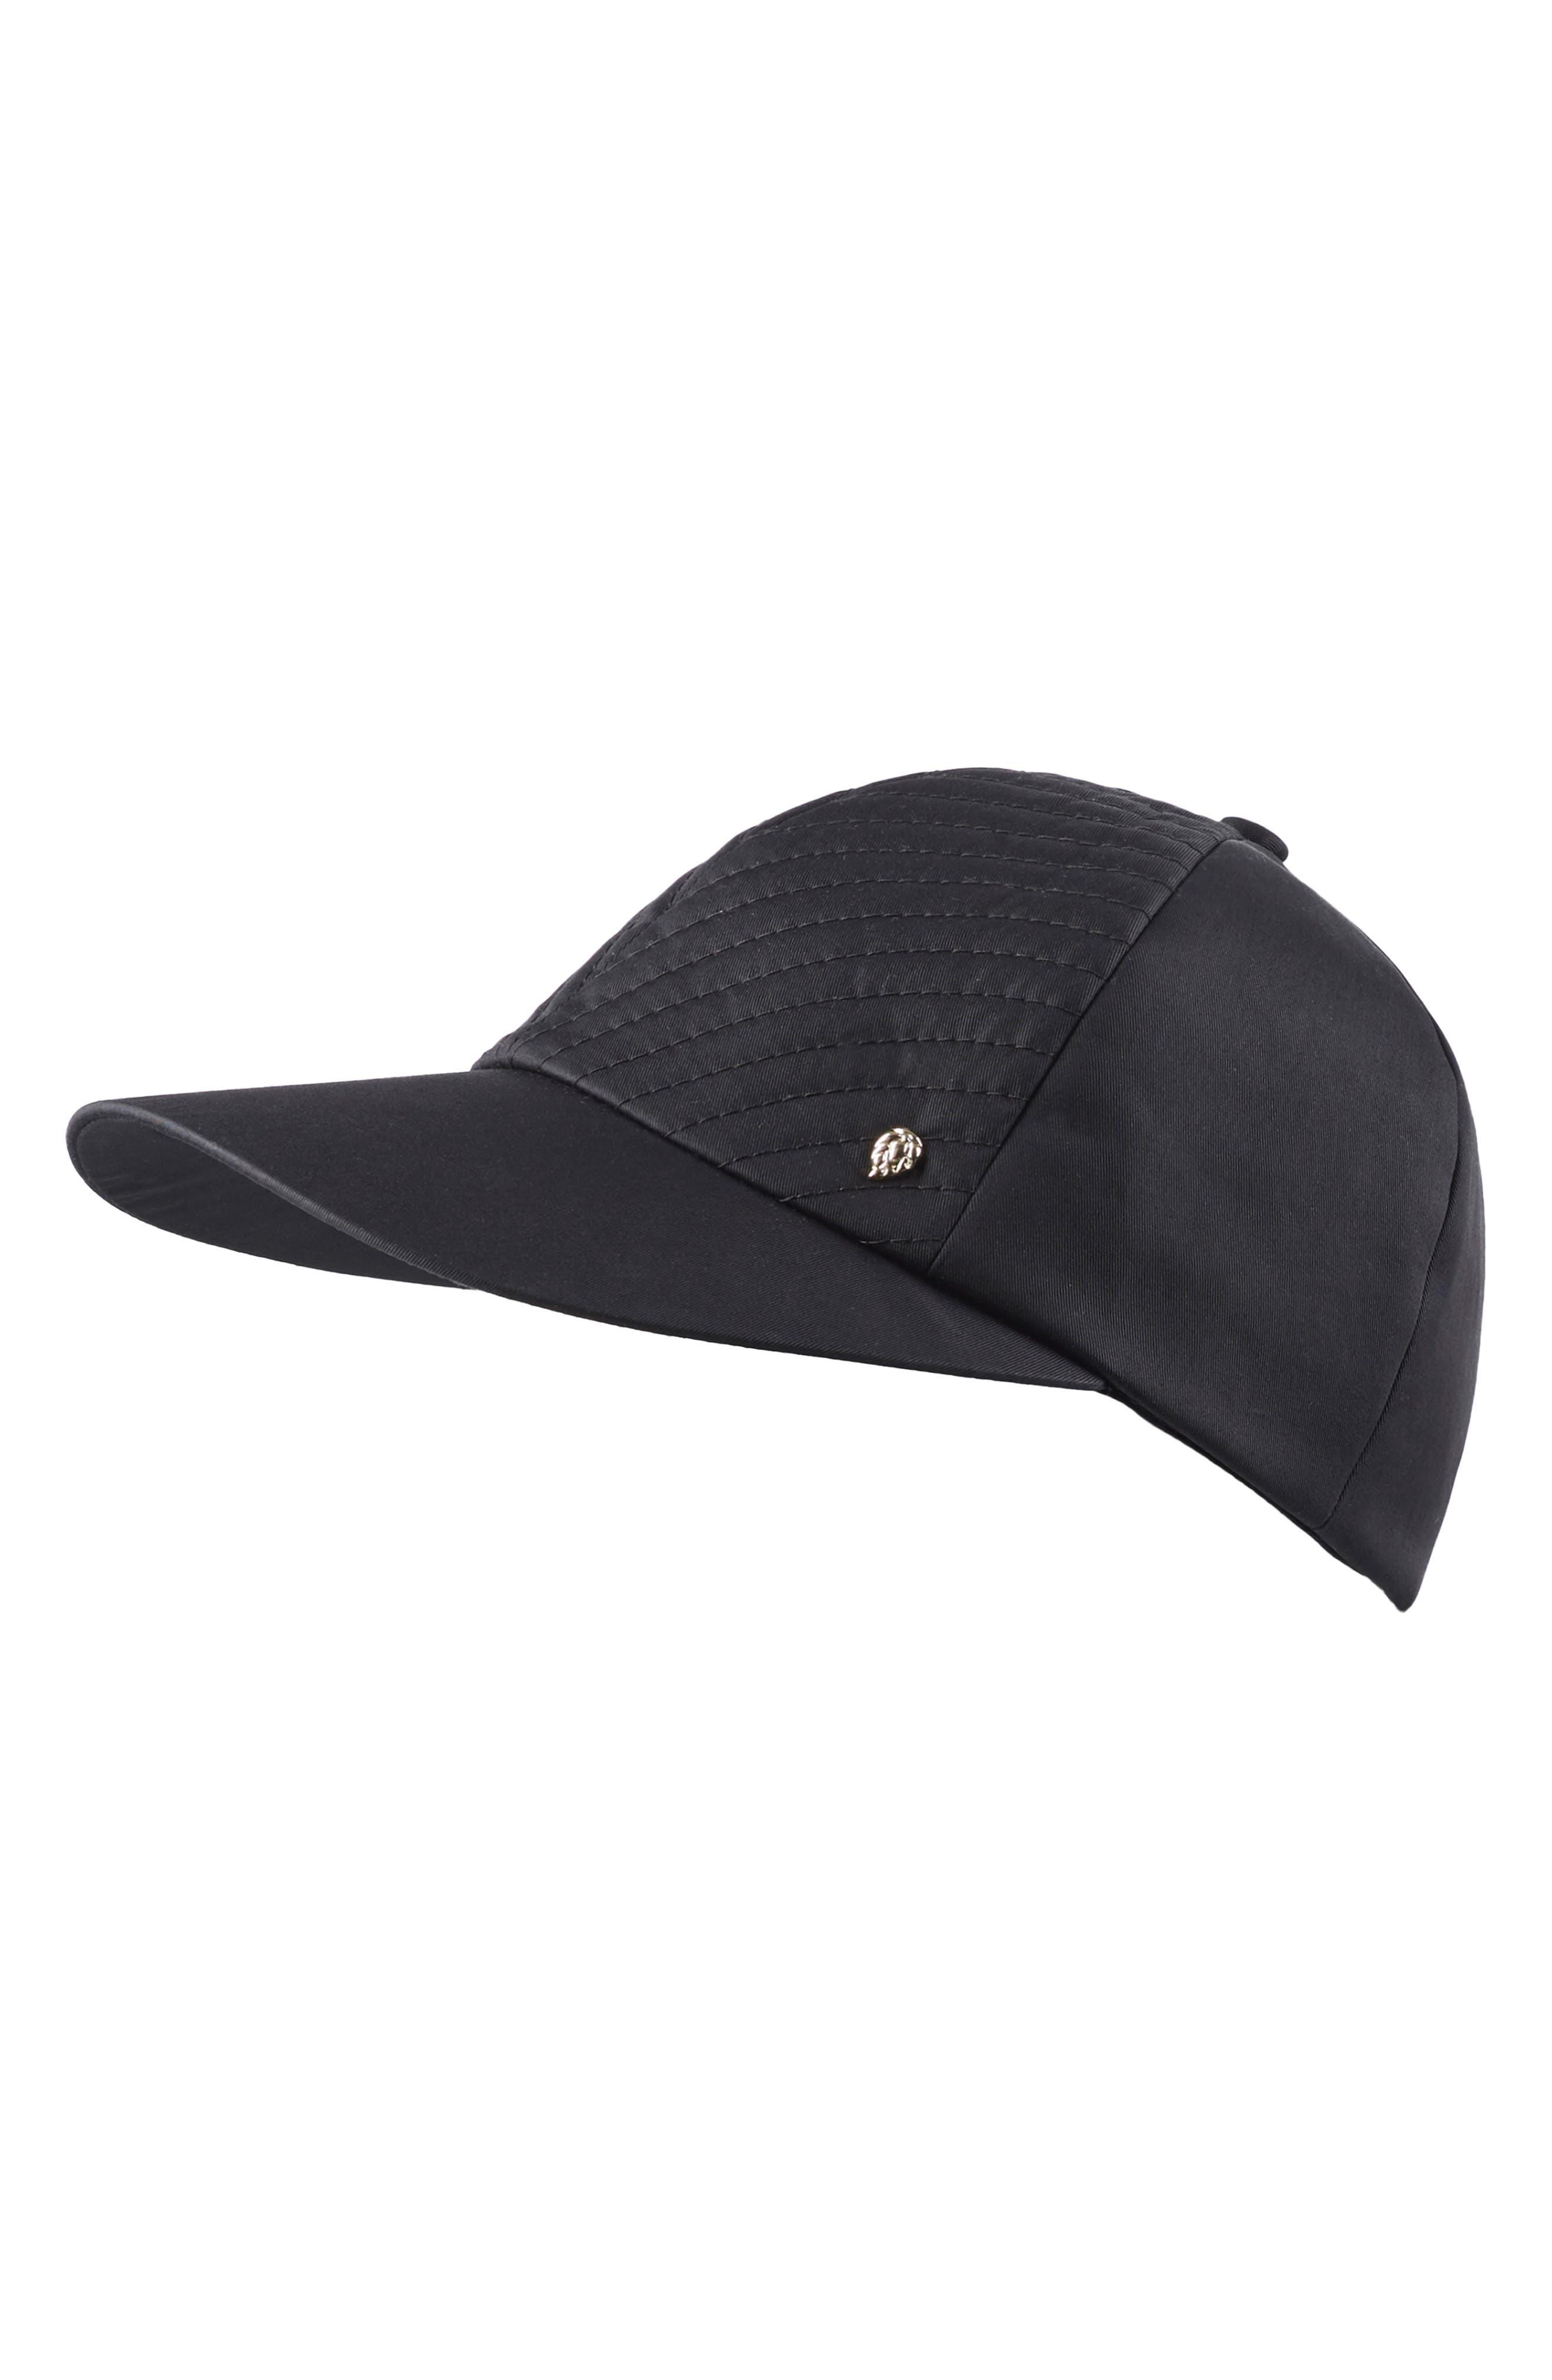 HELEN KAMINSKI,                             Water Resistant Baseball Cap,                             Main thumbnail 1, color,                             BLACK